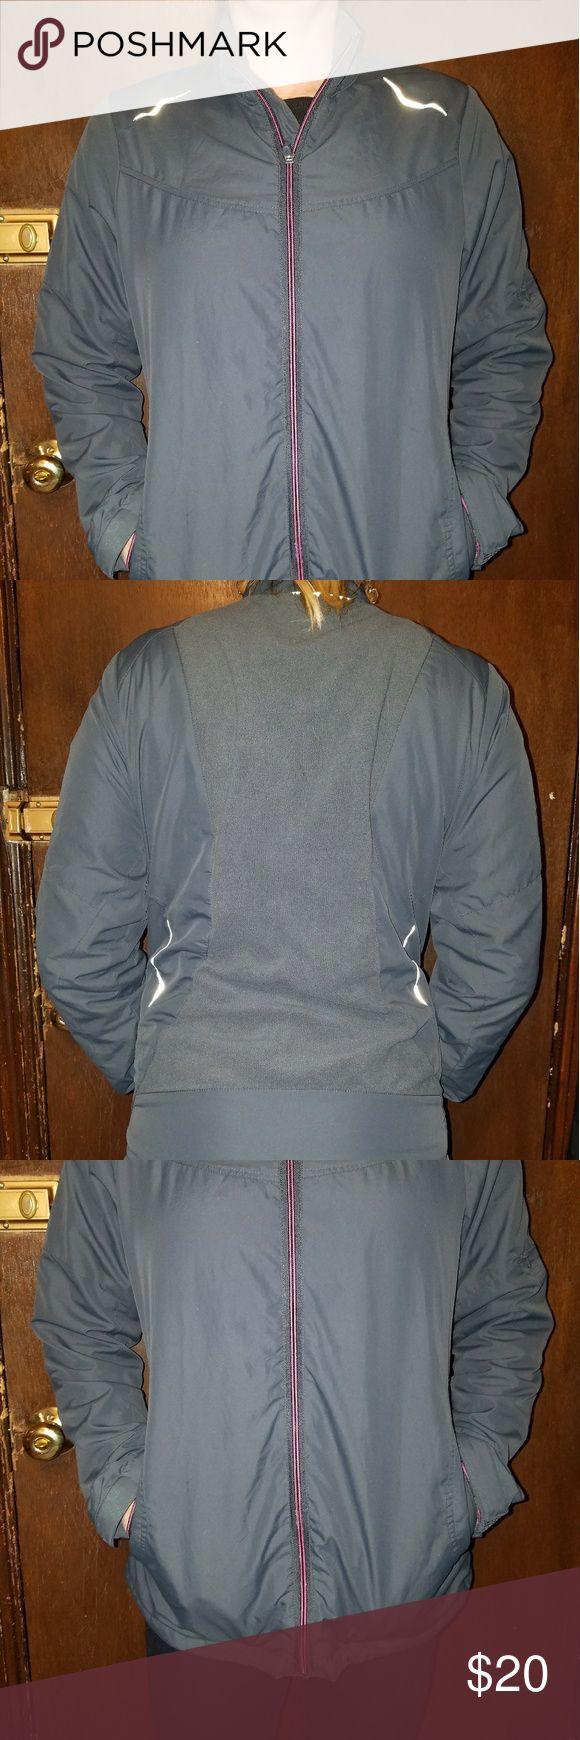 Women's Running Jacket Great running jacket! It is lightweight, but quite warm. The inside has a thin fleece lining. Jackets & Coats